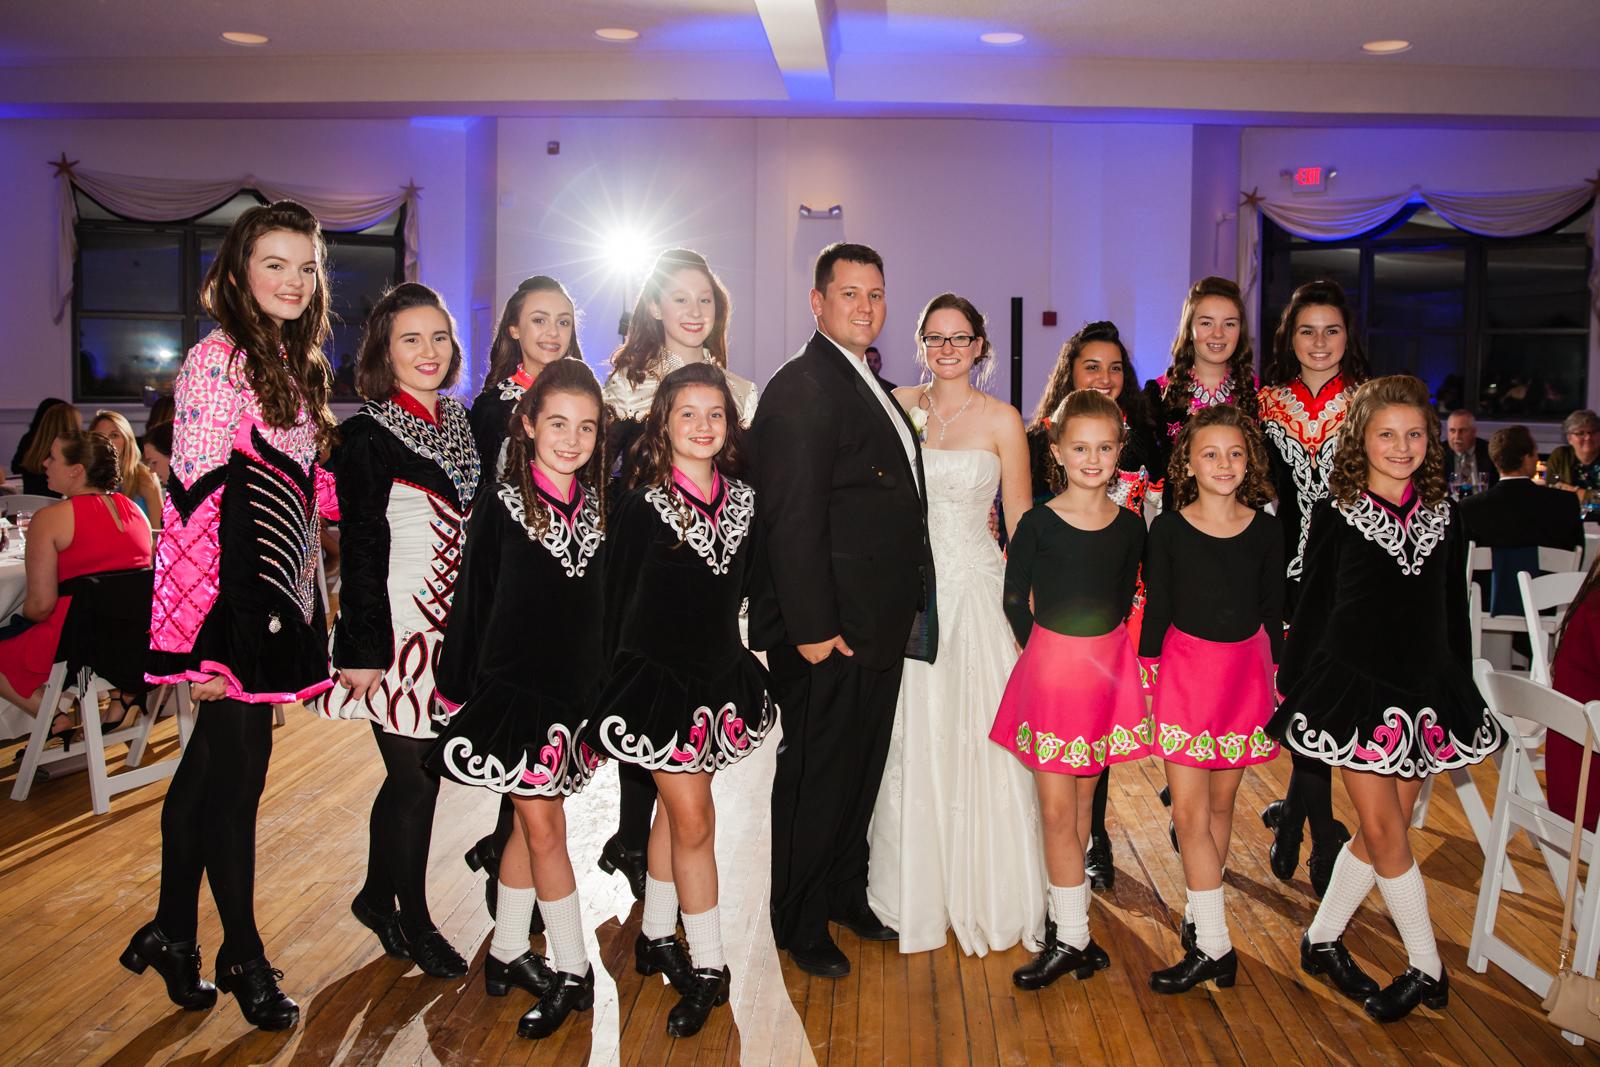 Eastons-Beach-Rotunda-Ballroom-Wedding-Newport-Rhode-Island-PhotographybyAmandaMorgan-116.jpg